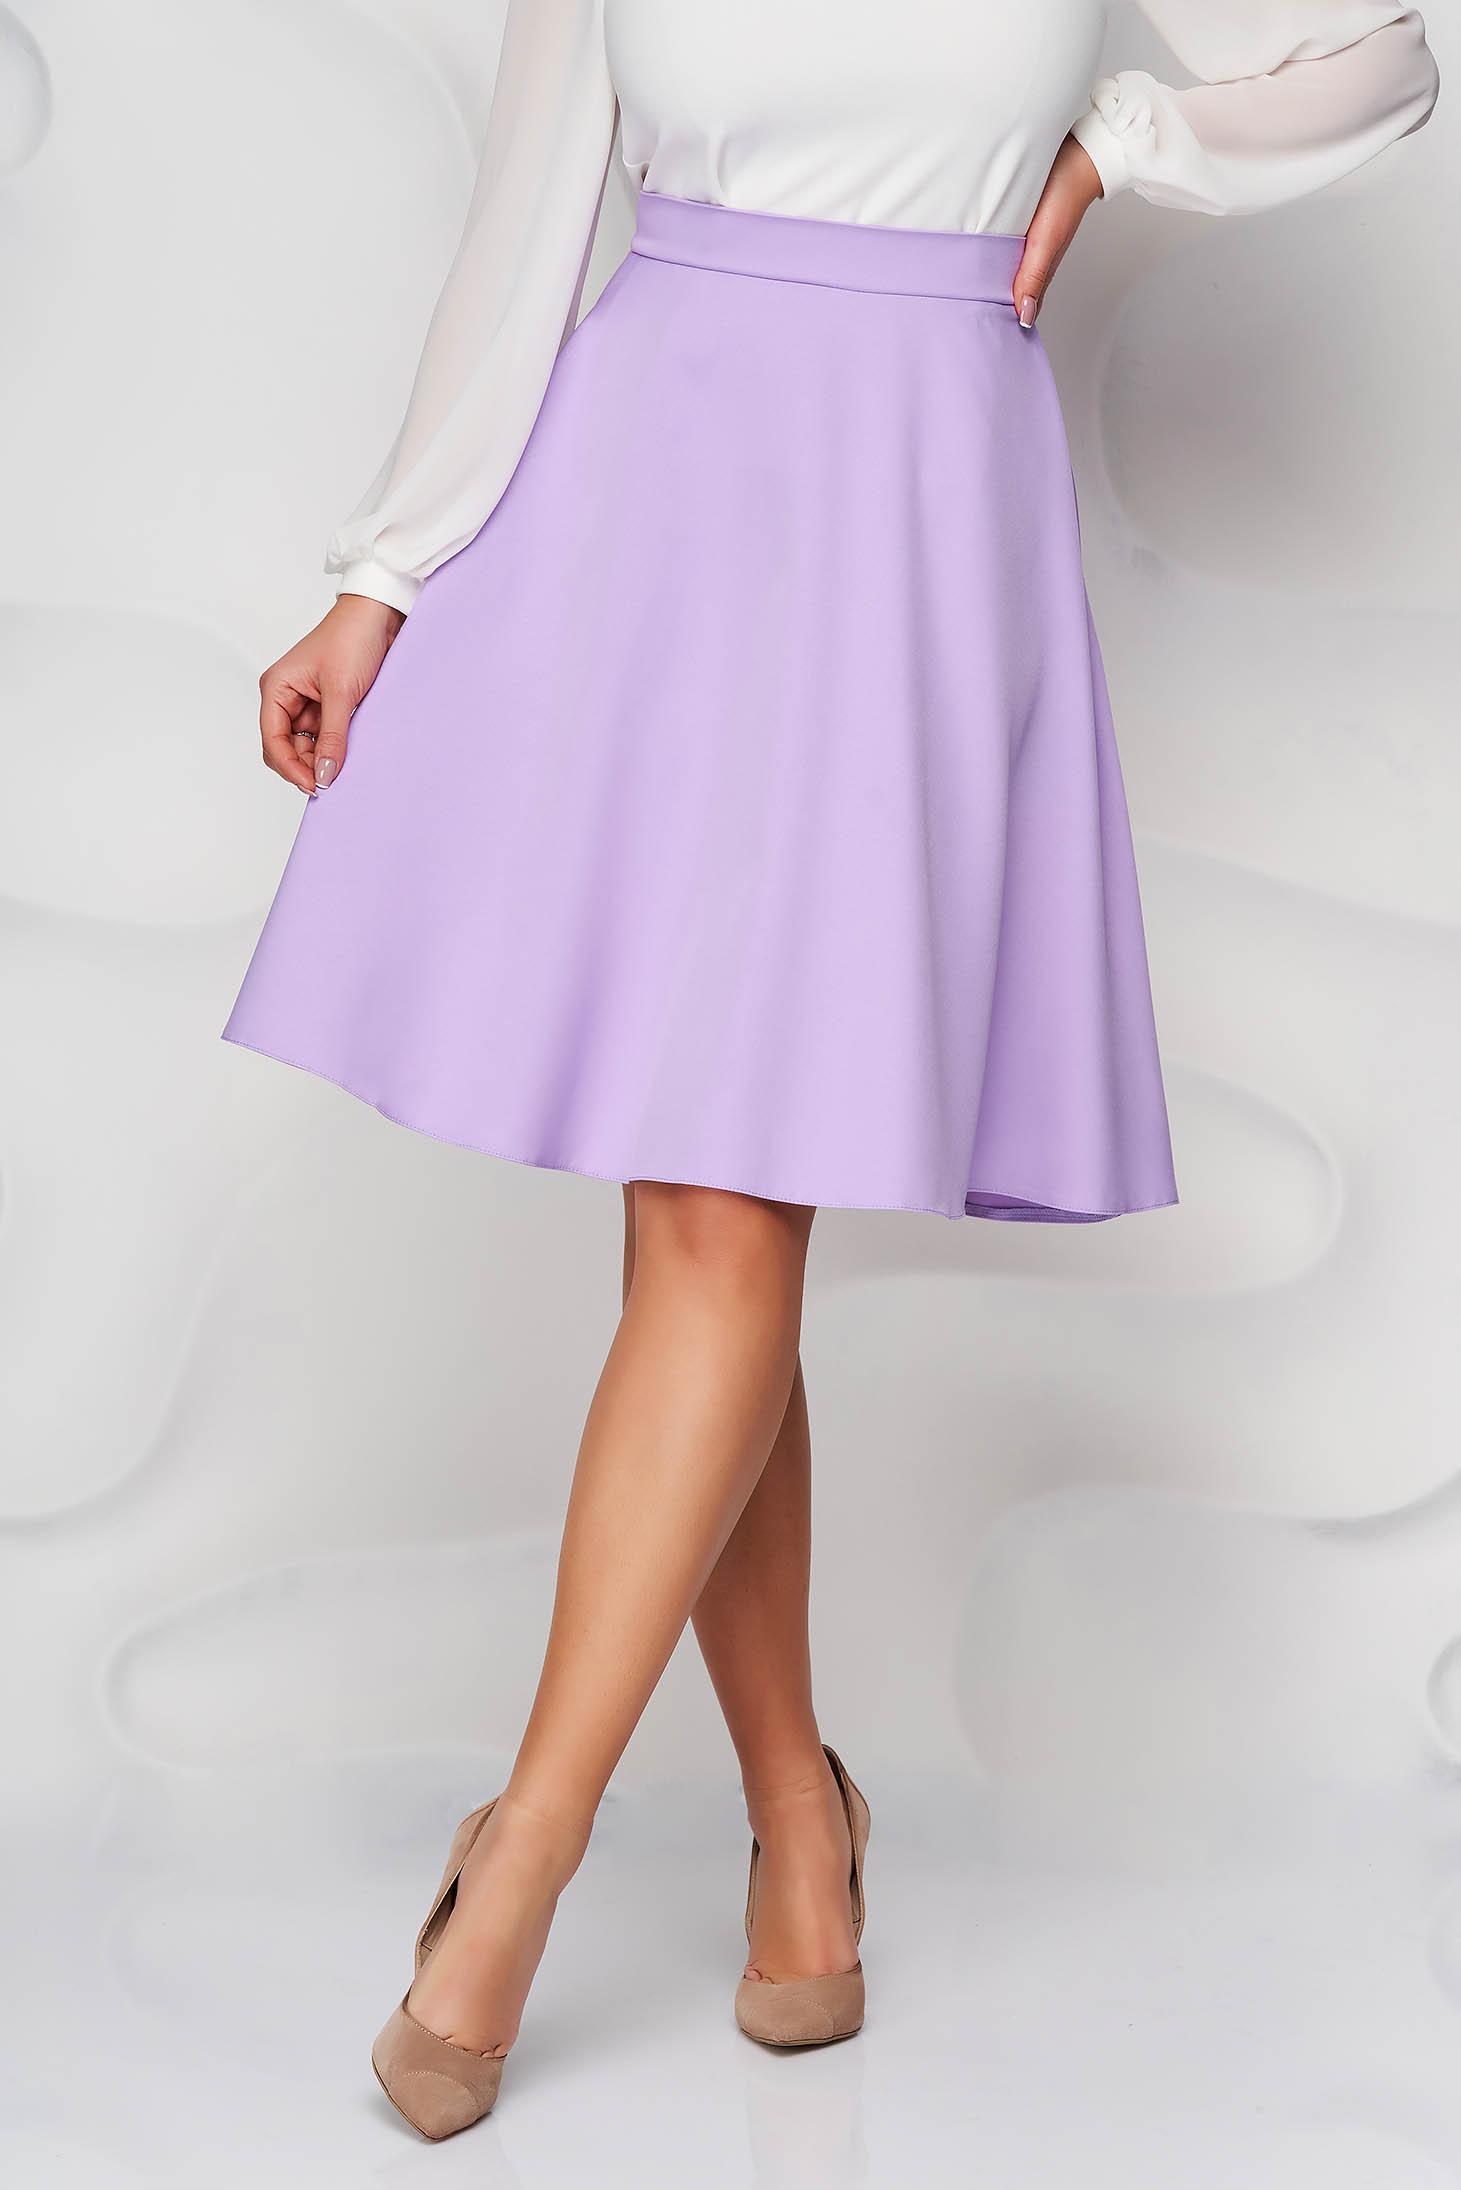 StarShinerS lila elegant cloche skirt high waisted slightly elastic fabric office